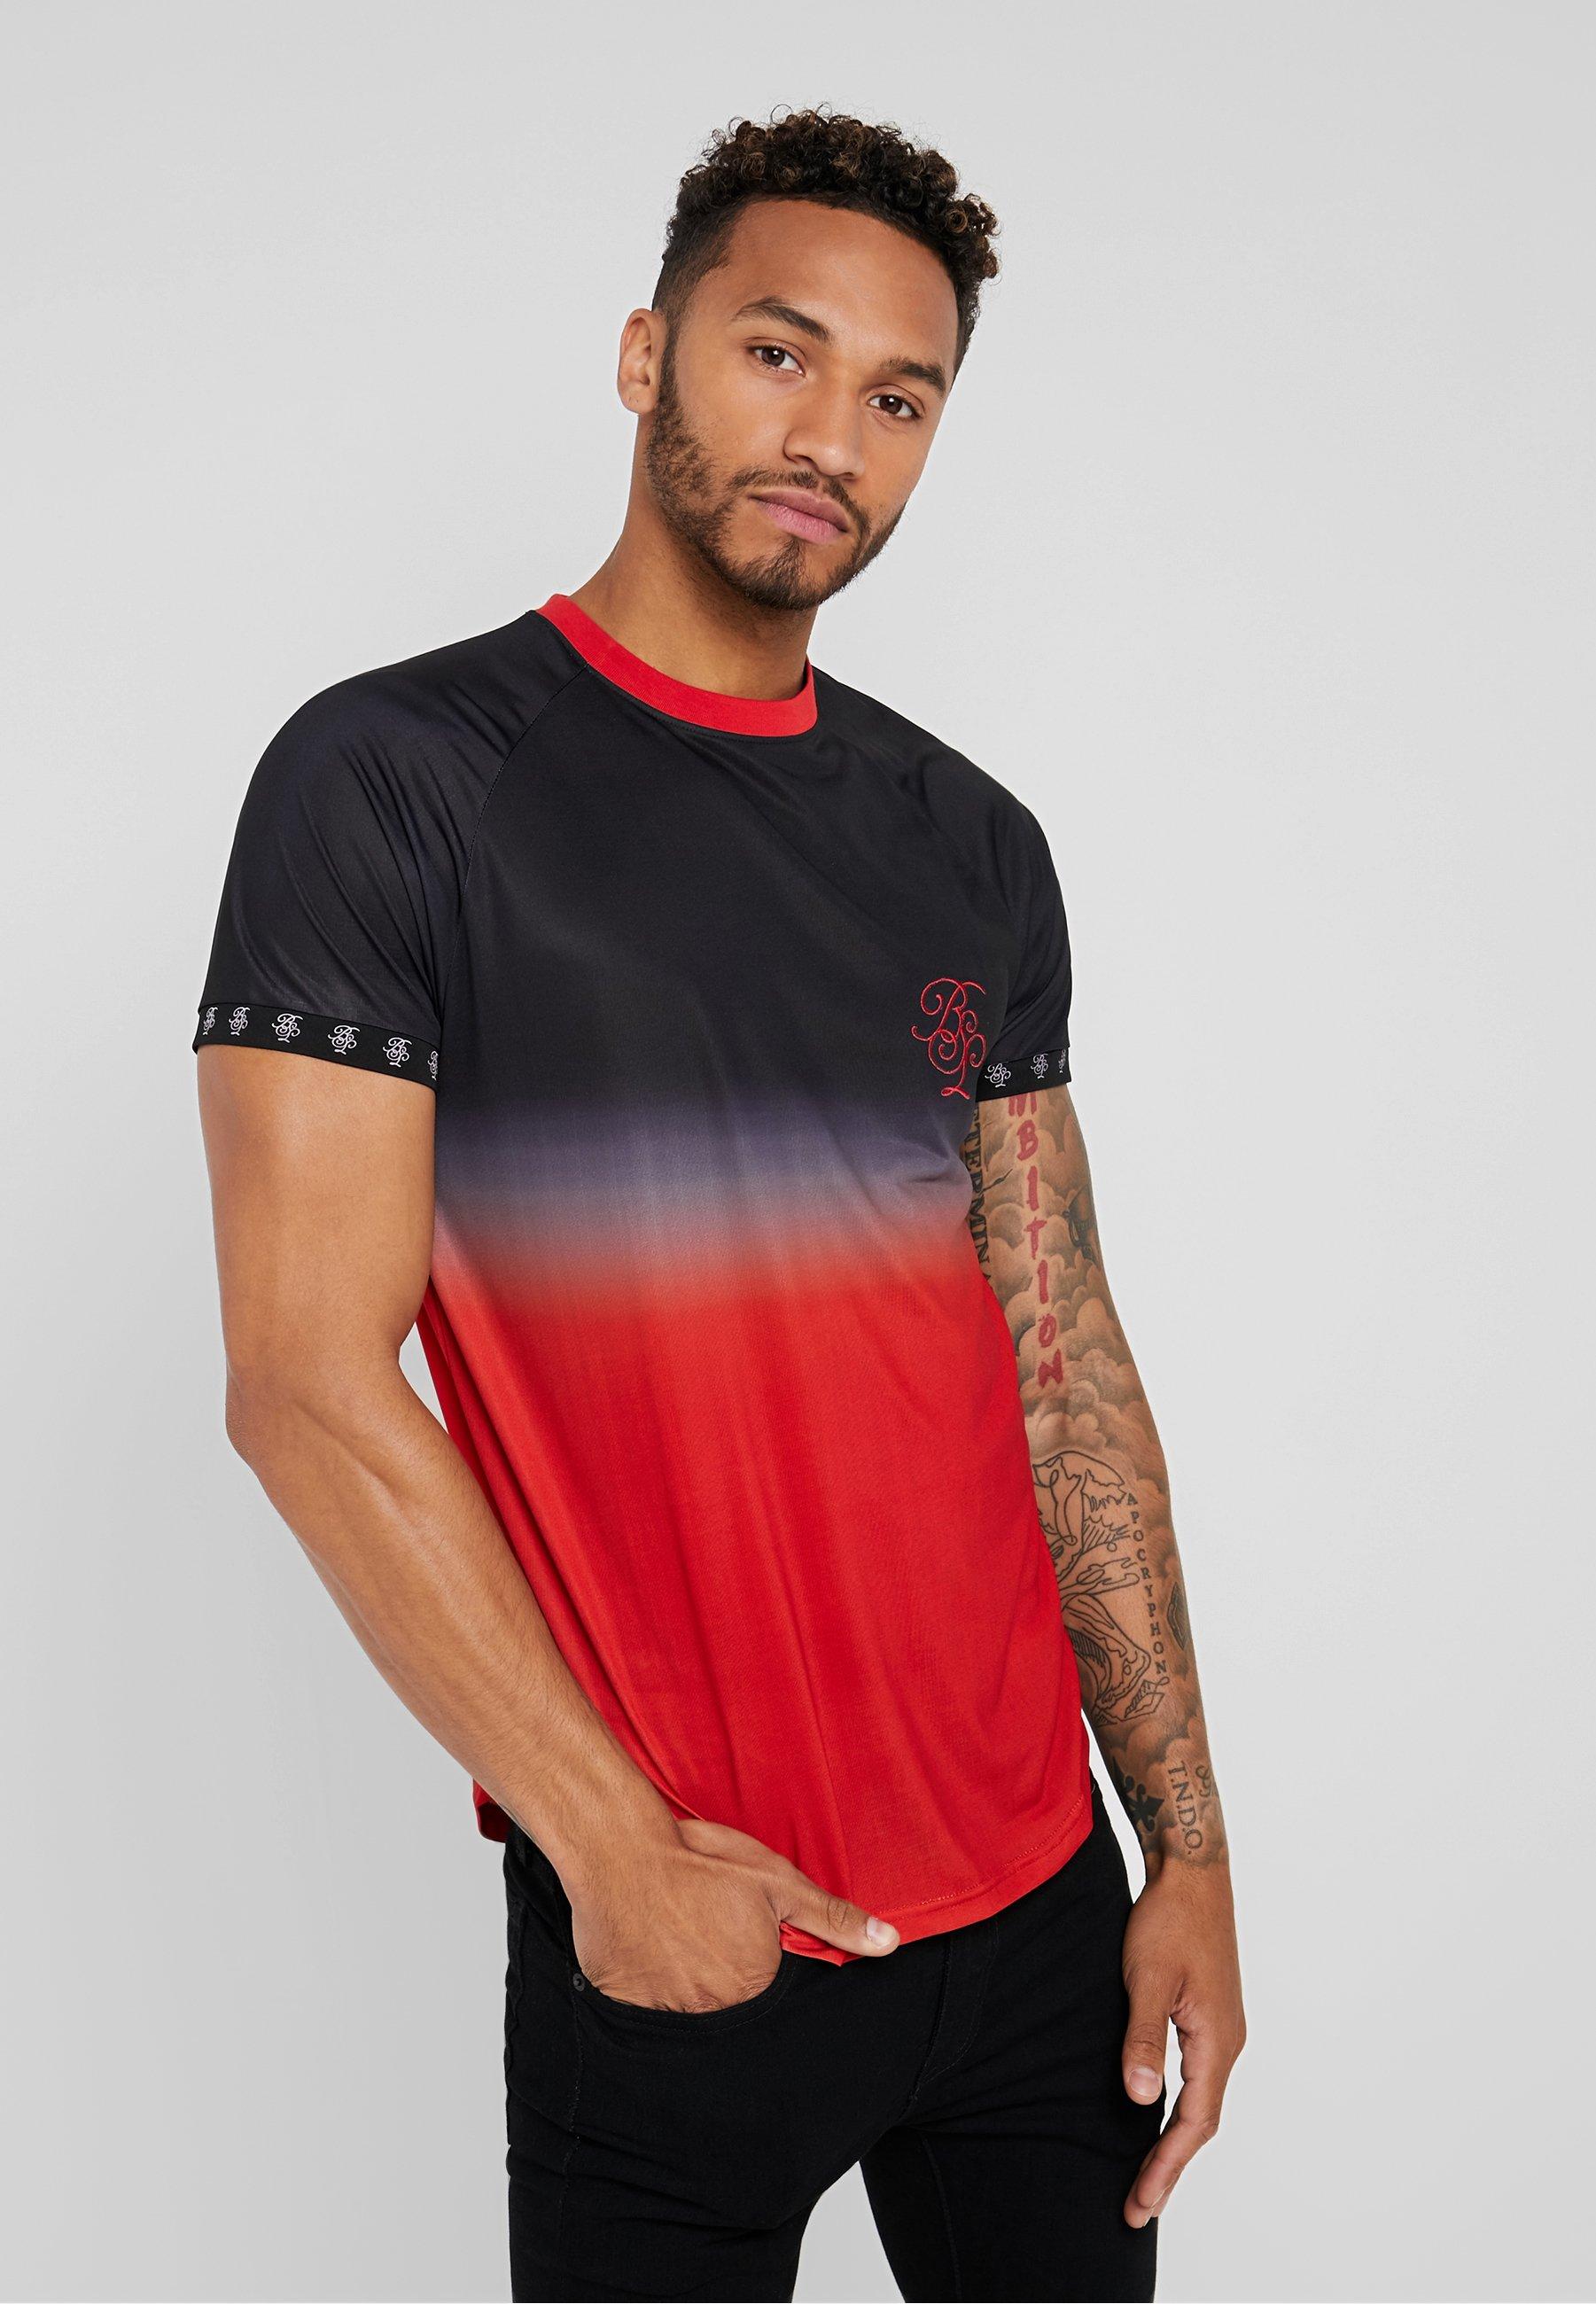 Soul Imprimé Black GradientT shirt red Brave vN8wOnm0